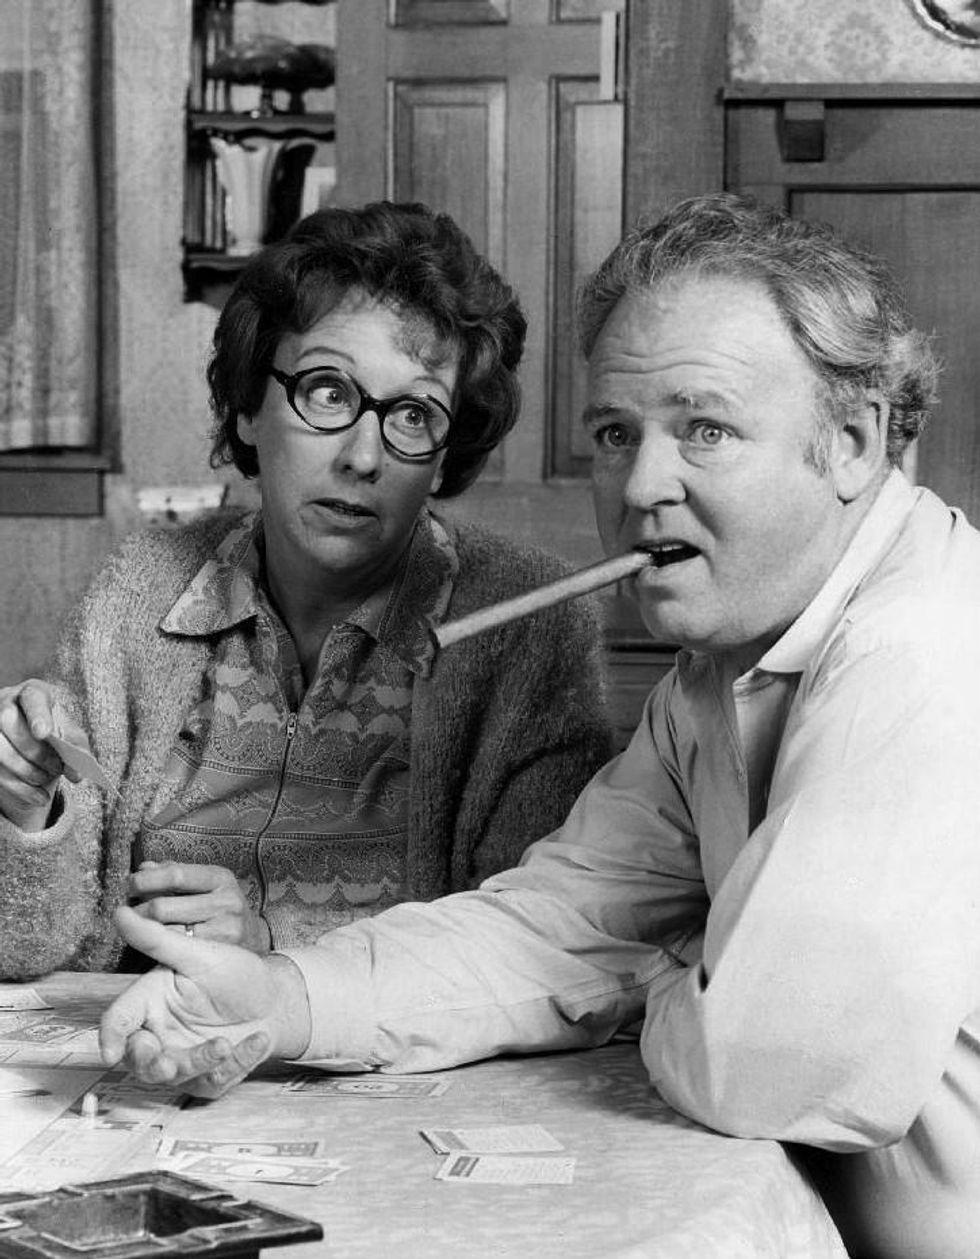 DeSantis Reminds Me Of Archie Bunker